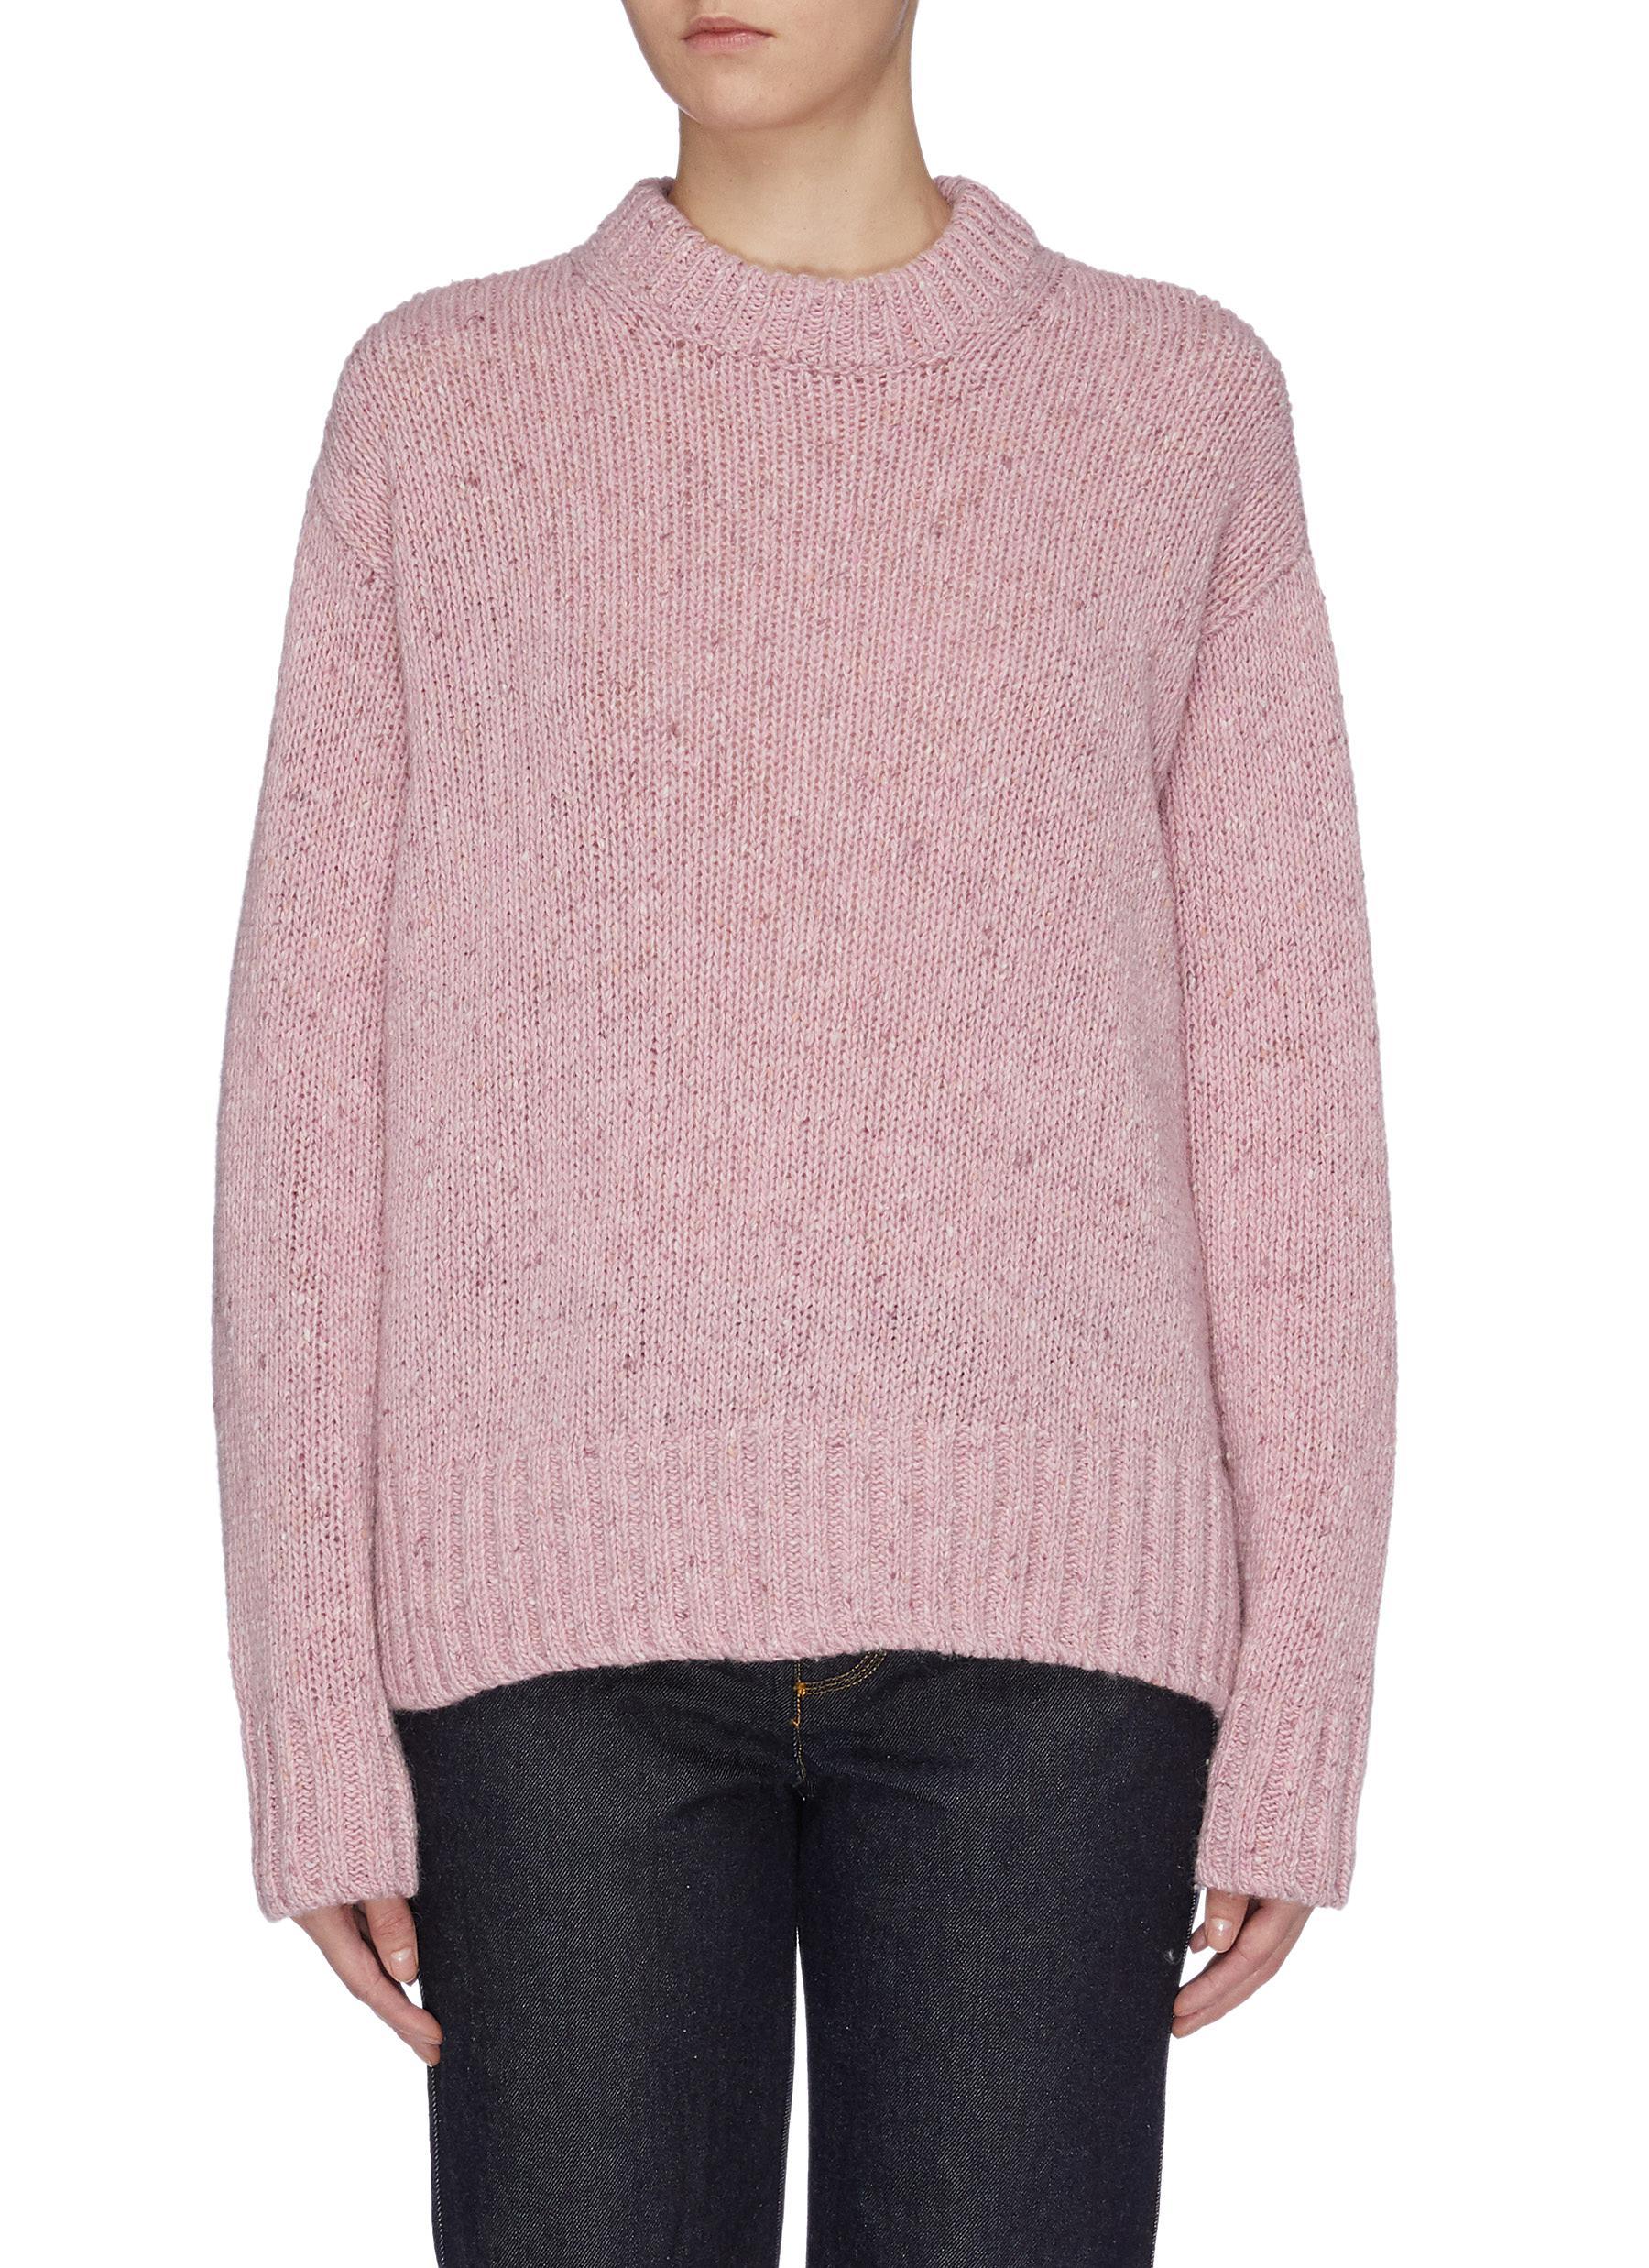 Tweed Knit Merino wool sweater by Joseph